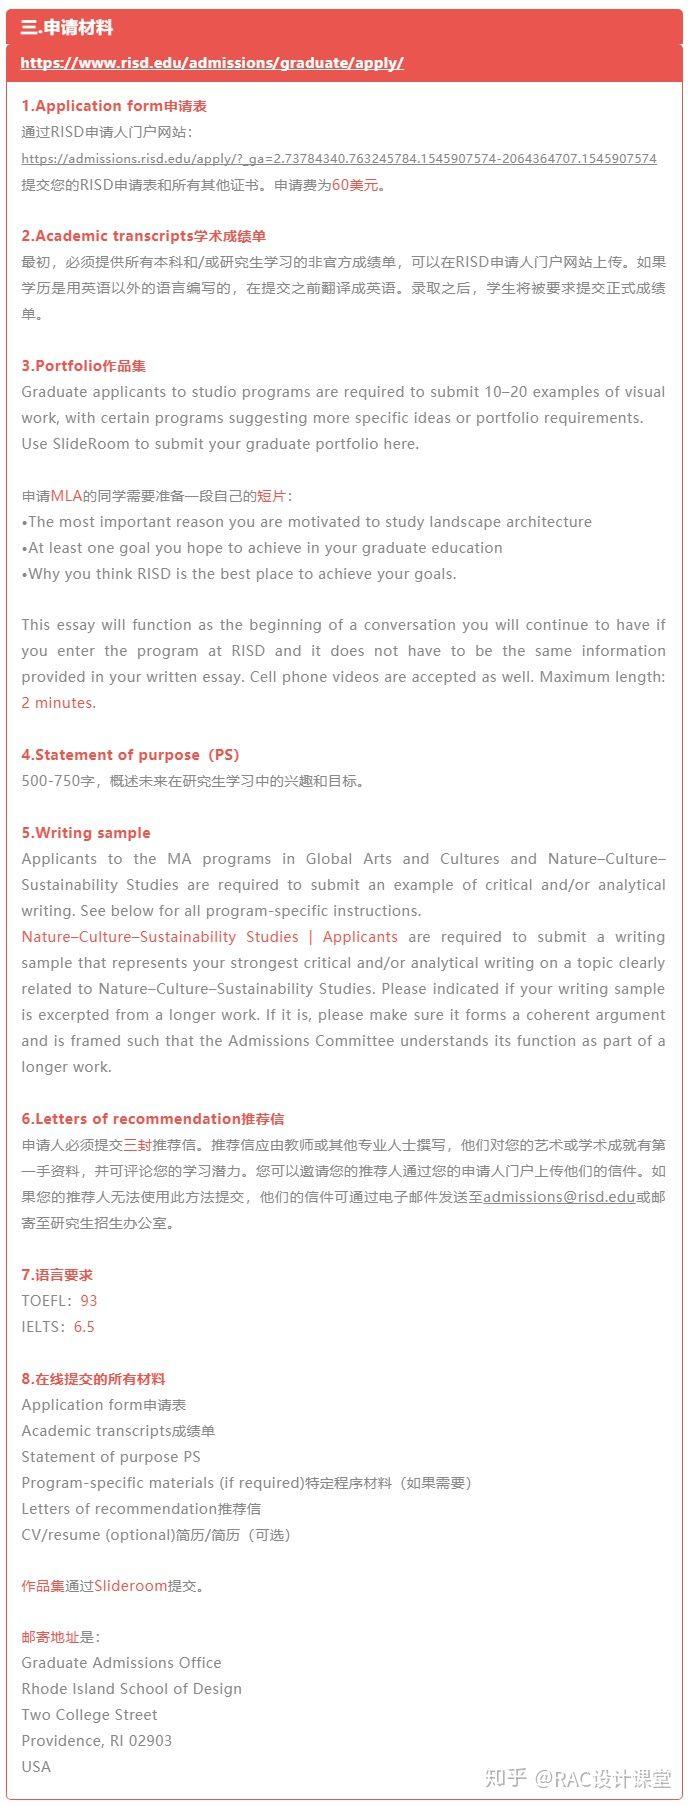 risd letter of recommendation - Hizir kaptanband co